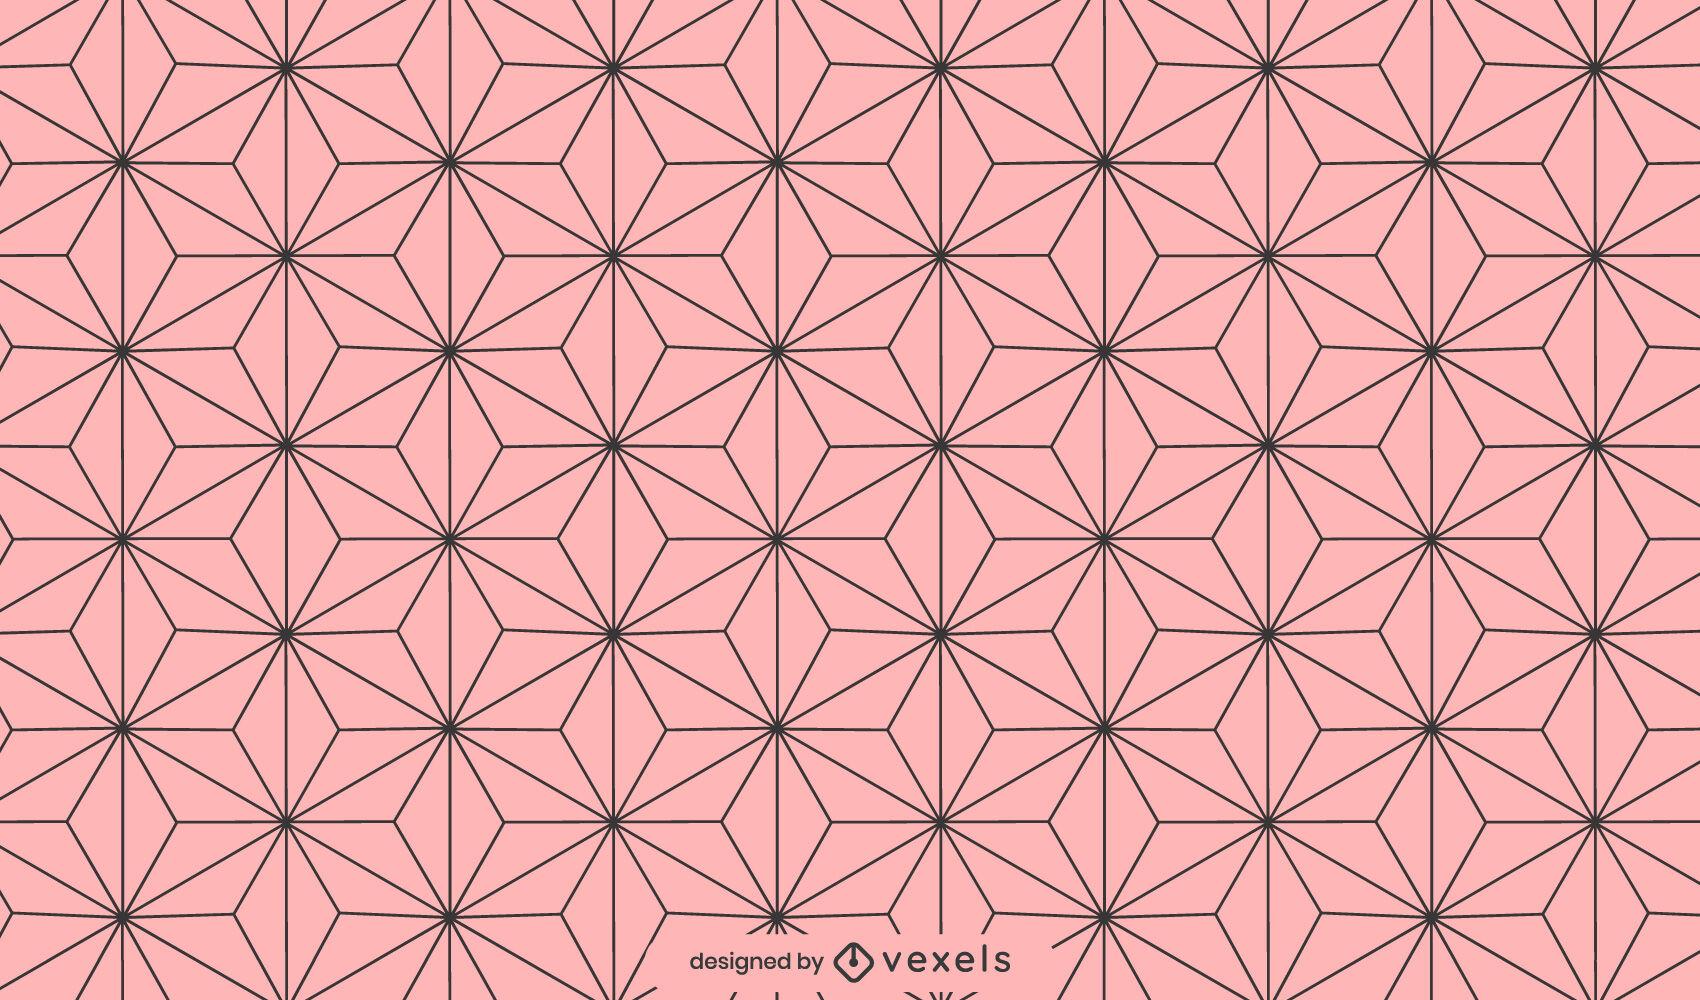 Asanoha hinterlässt geometrisches Musterdesign